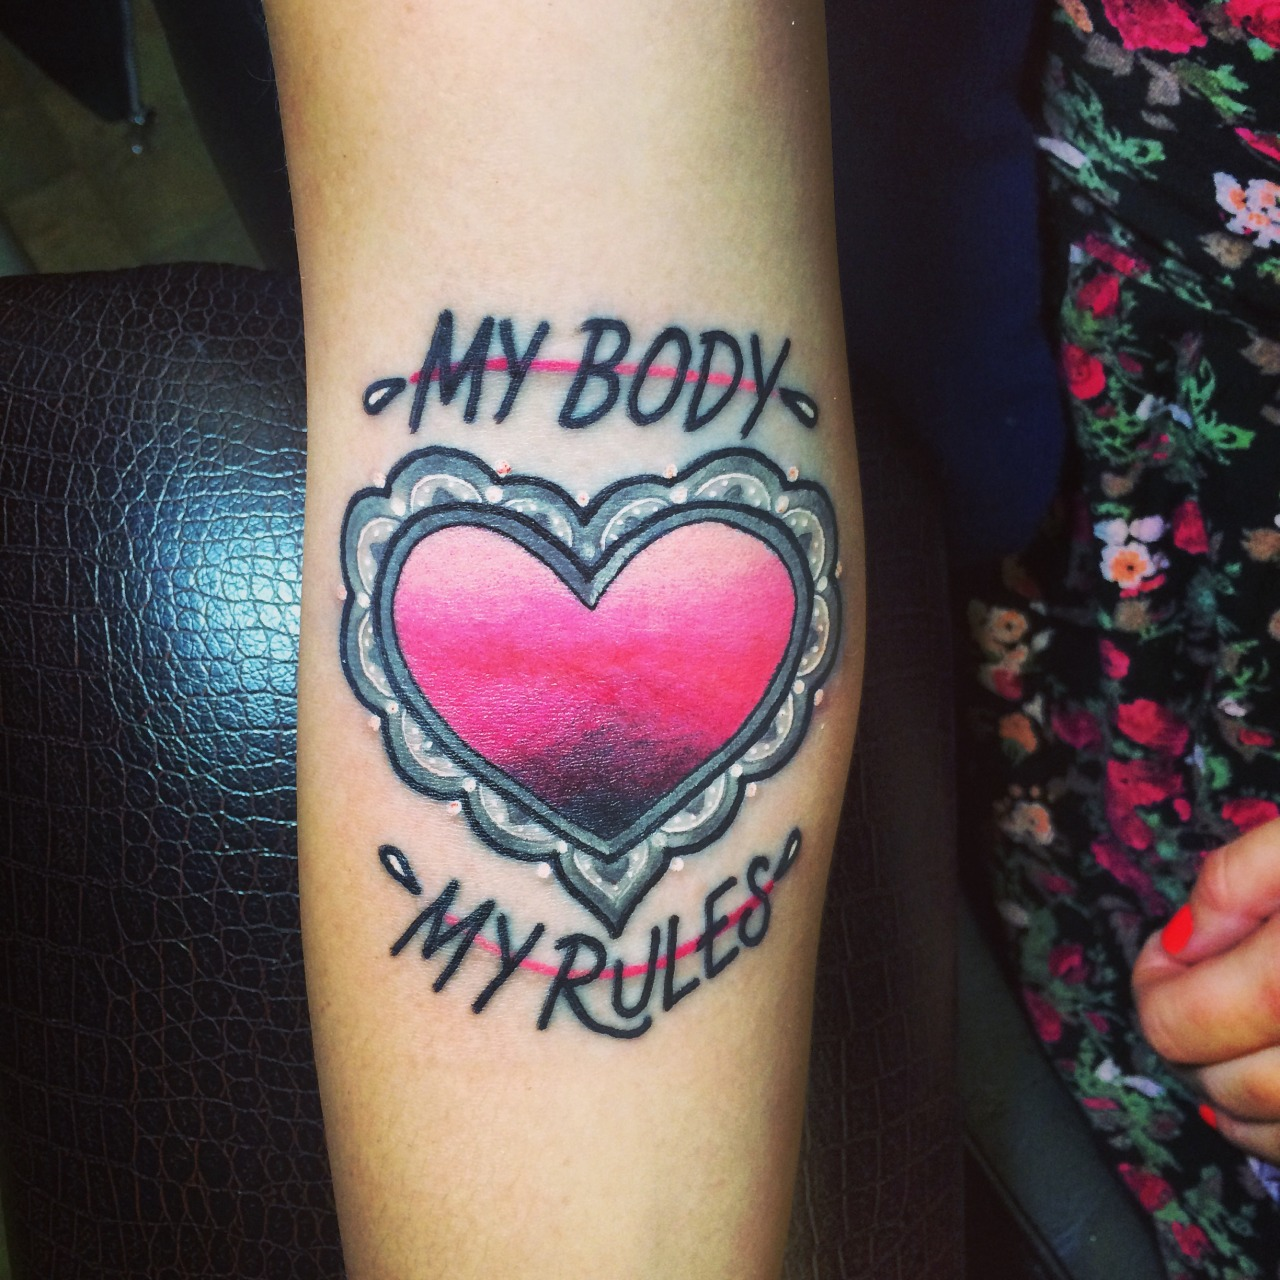 girl power tattoo quotes 4 ohm dvc subwoofer wiring diagrams tumblr nebxva5fae1qzabkfo1 1280 jpg